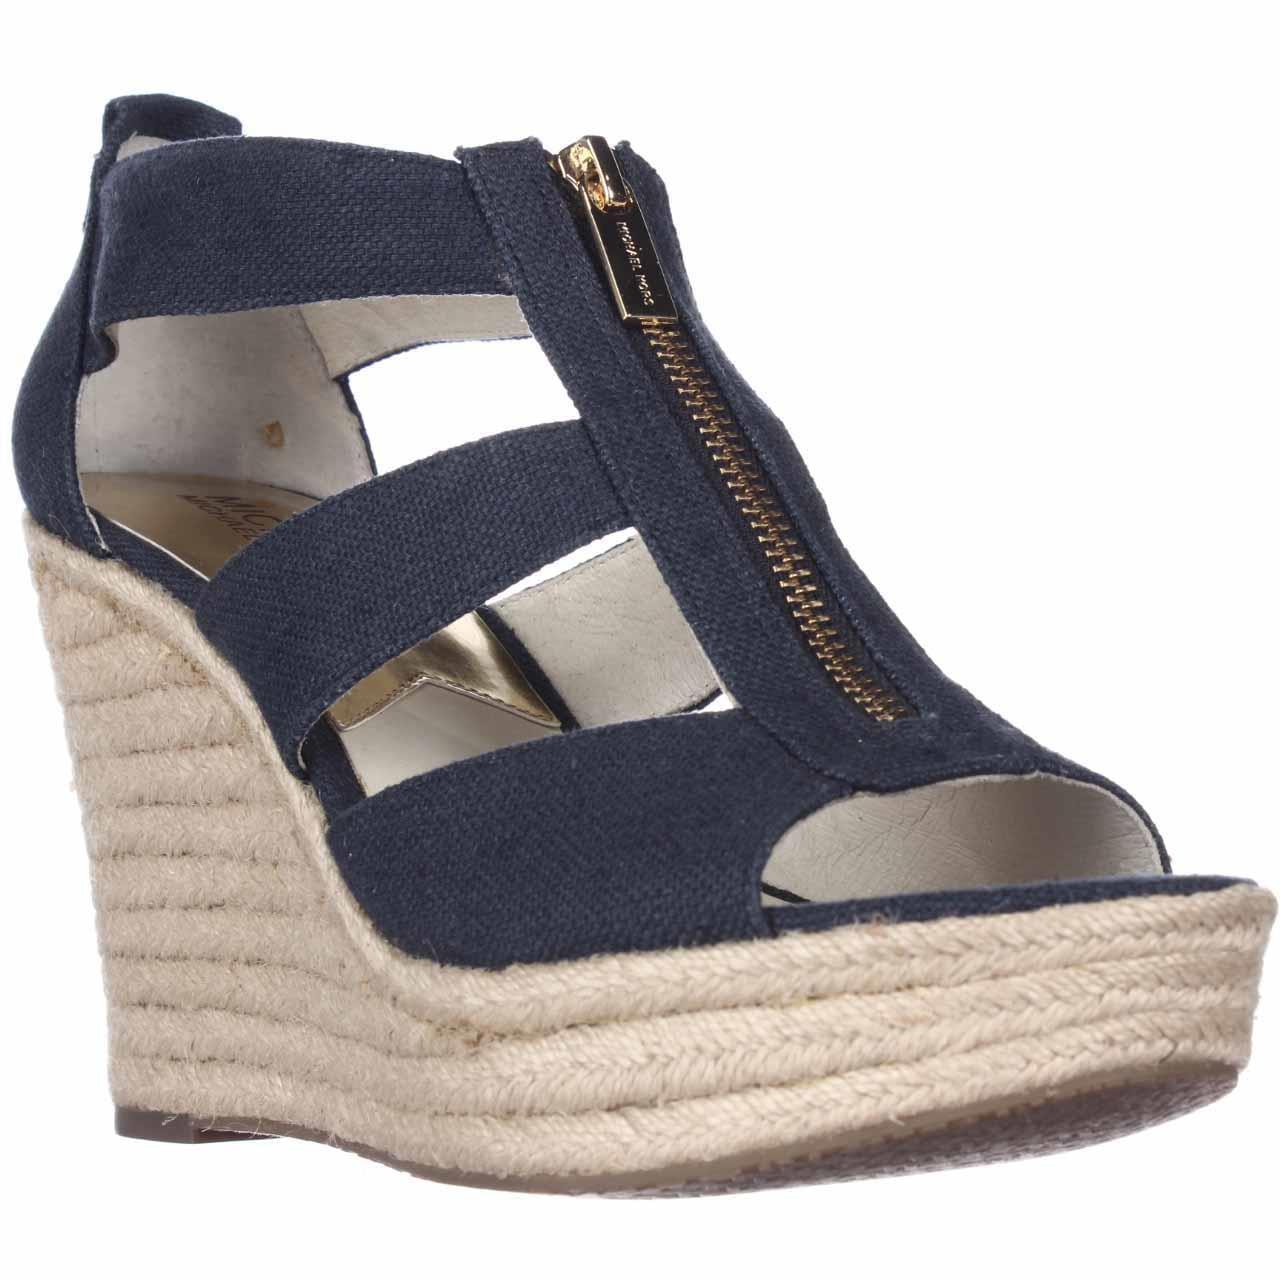 Michael Kors Damita Wedge Women US 8 Blue Wedge Sandal, Women's